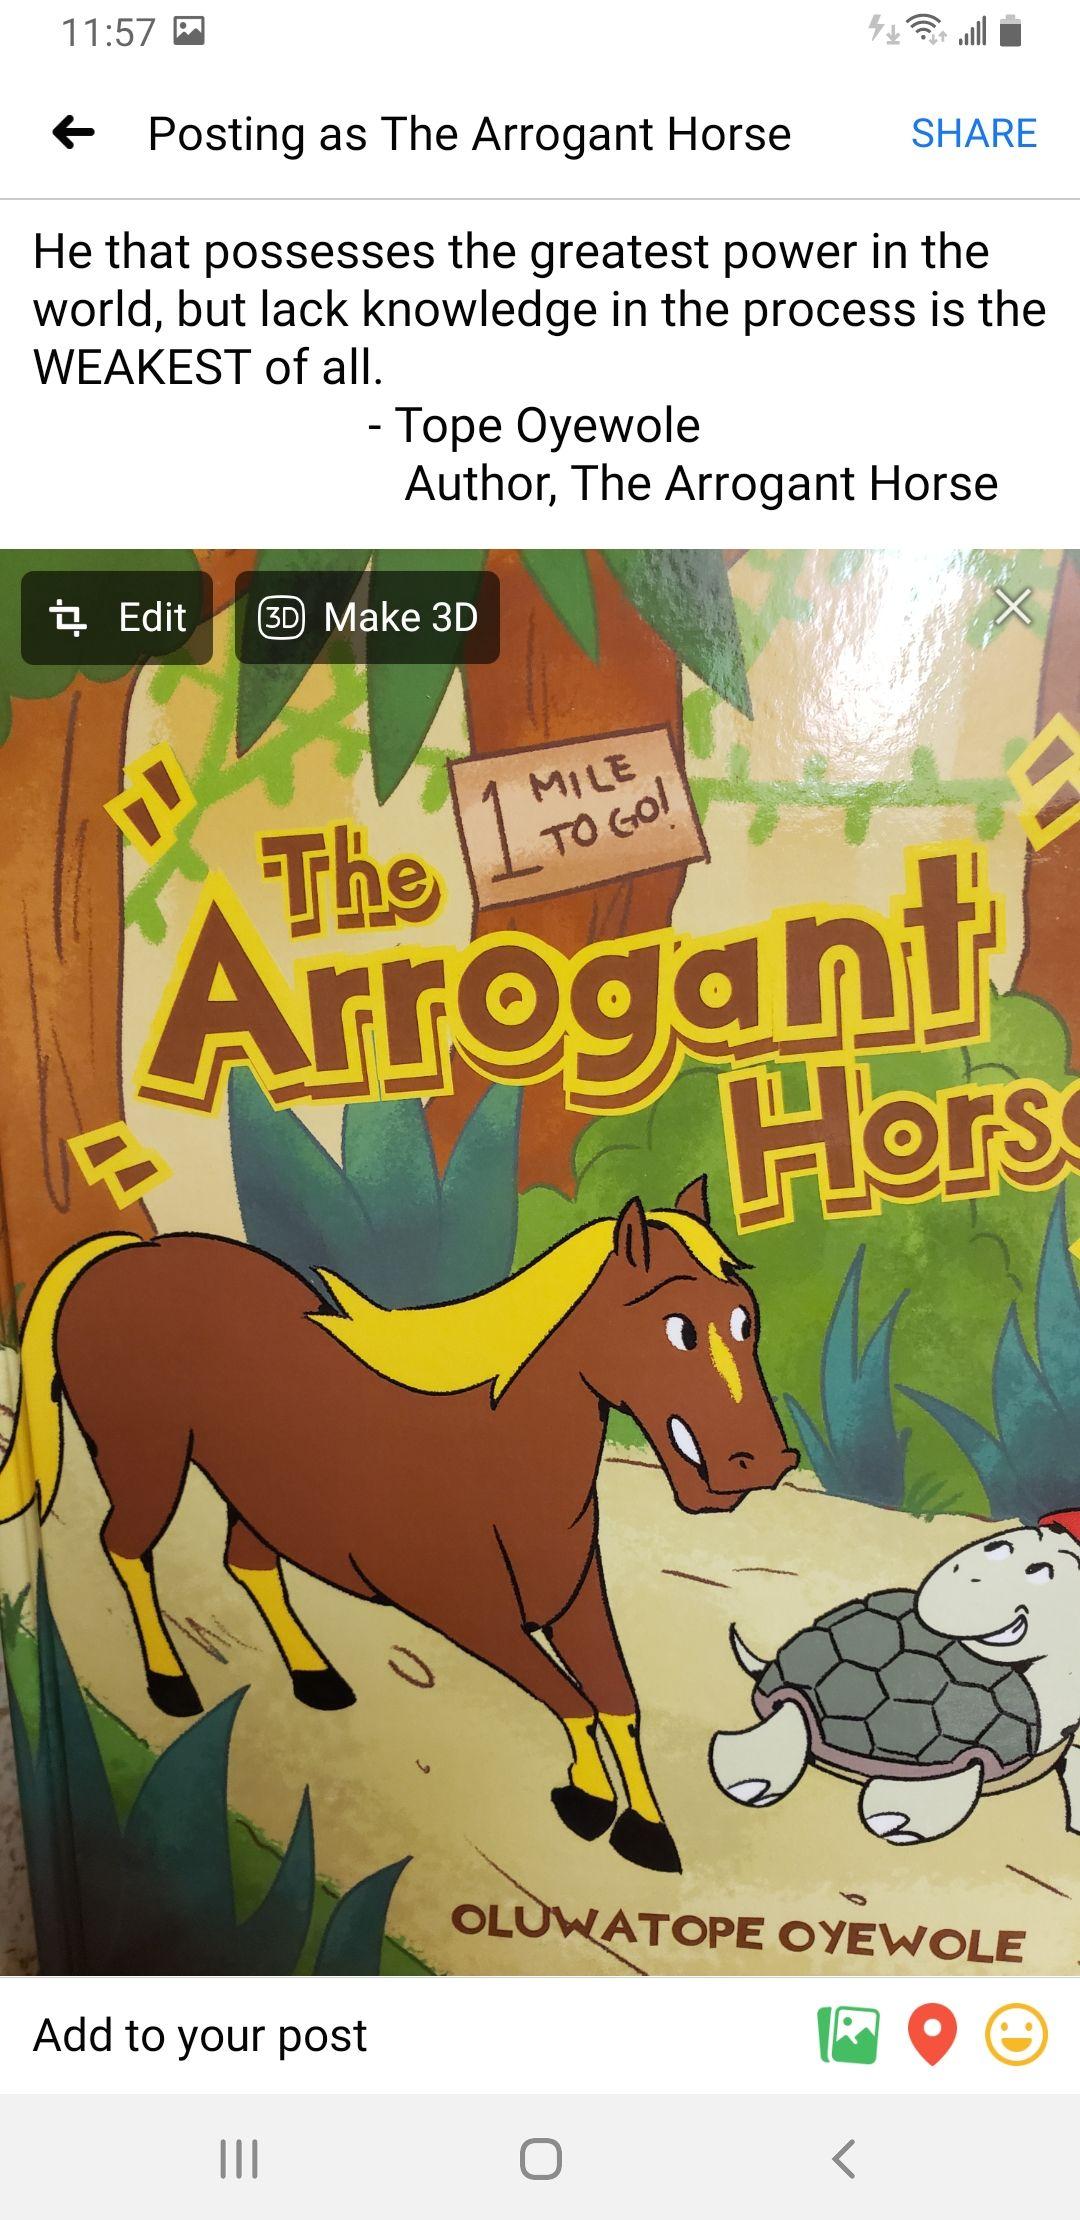 The Arrogant Horse's Book Image